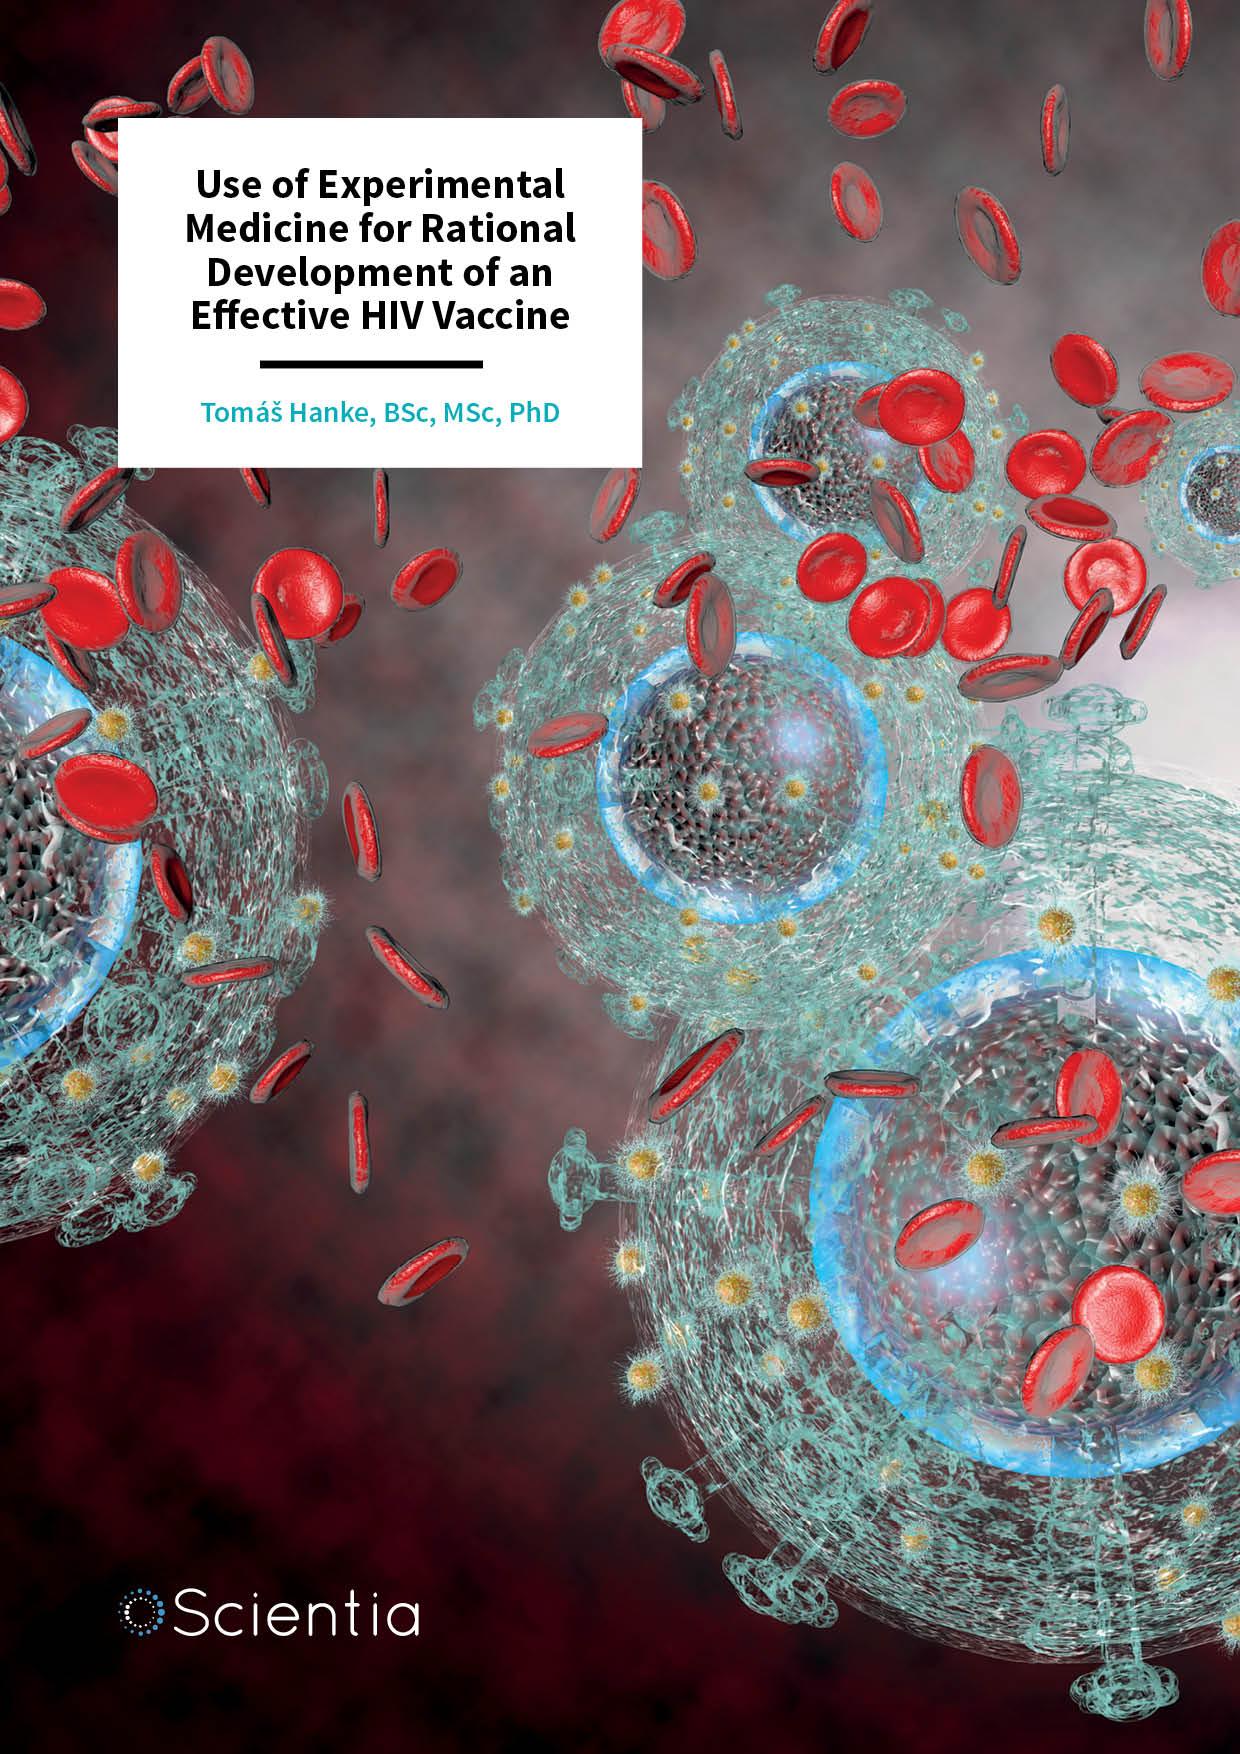 Professor Tomáš Hanke – Use of Experimental Medicine for Rational Development of an Effective HIV Vaccine